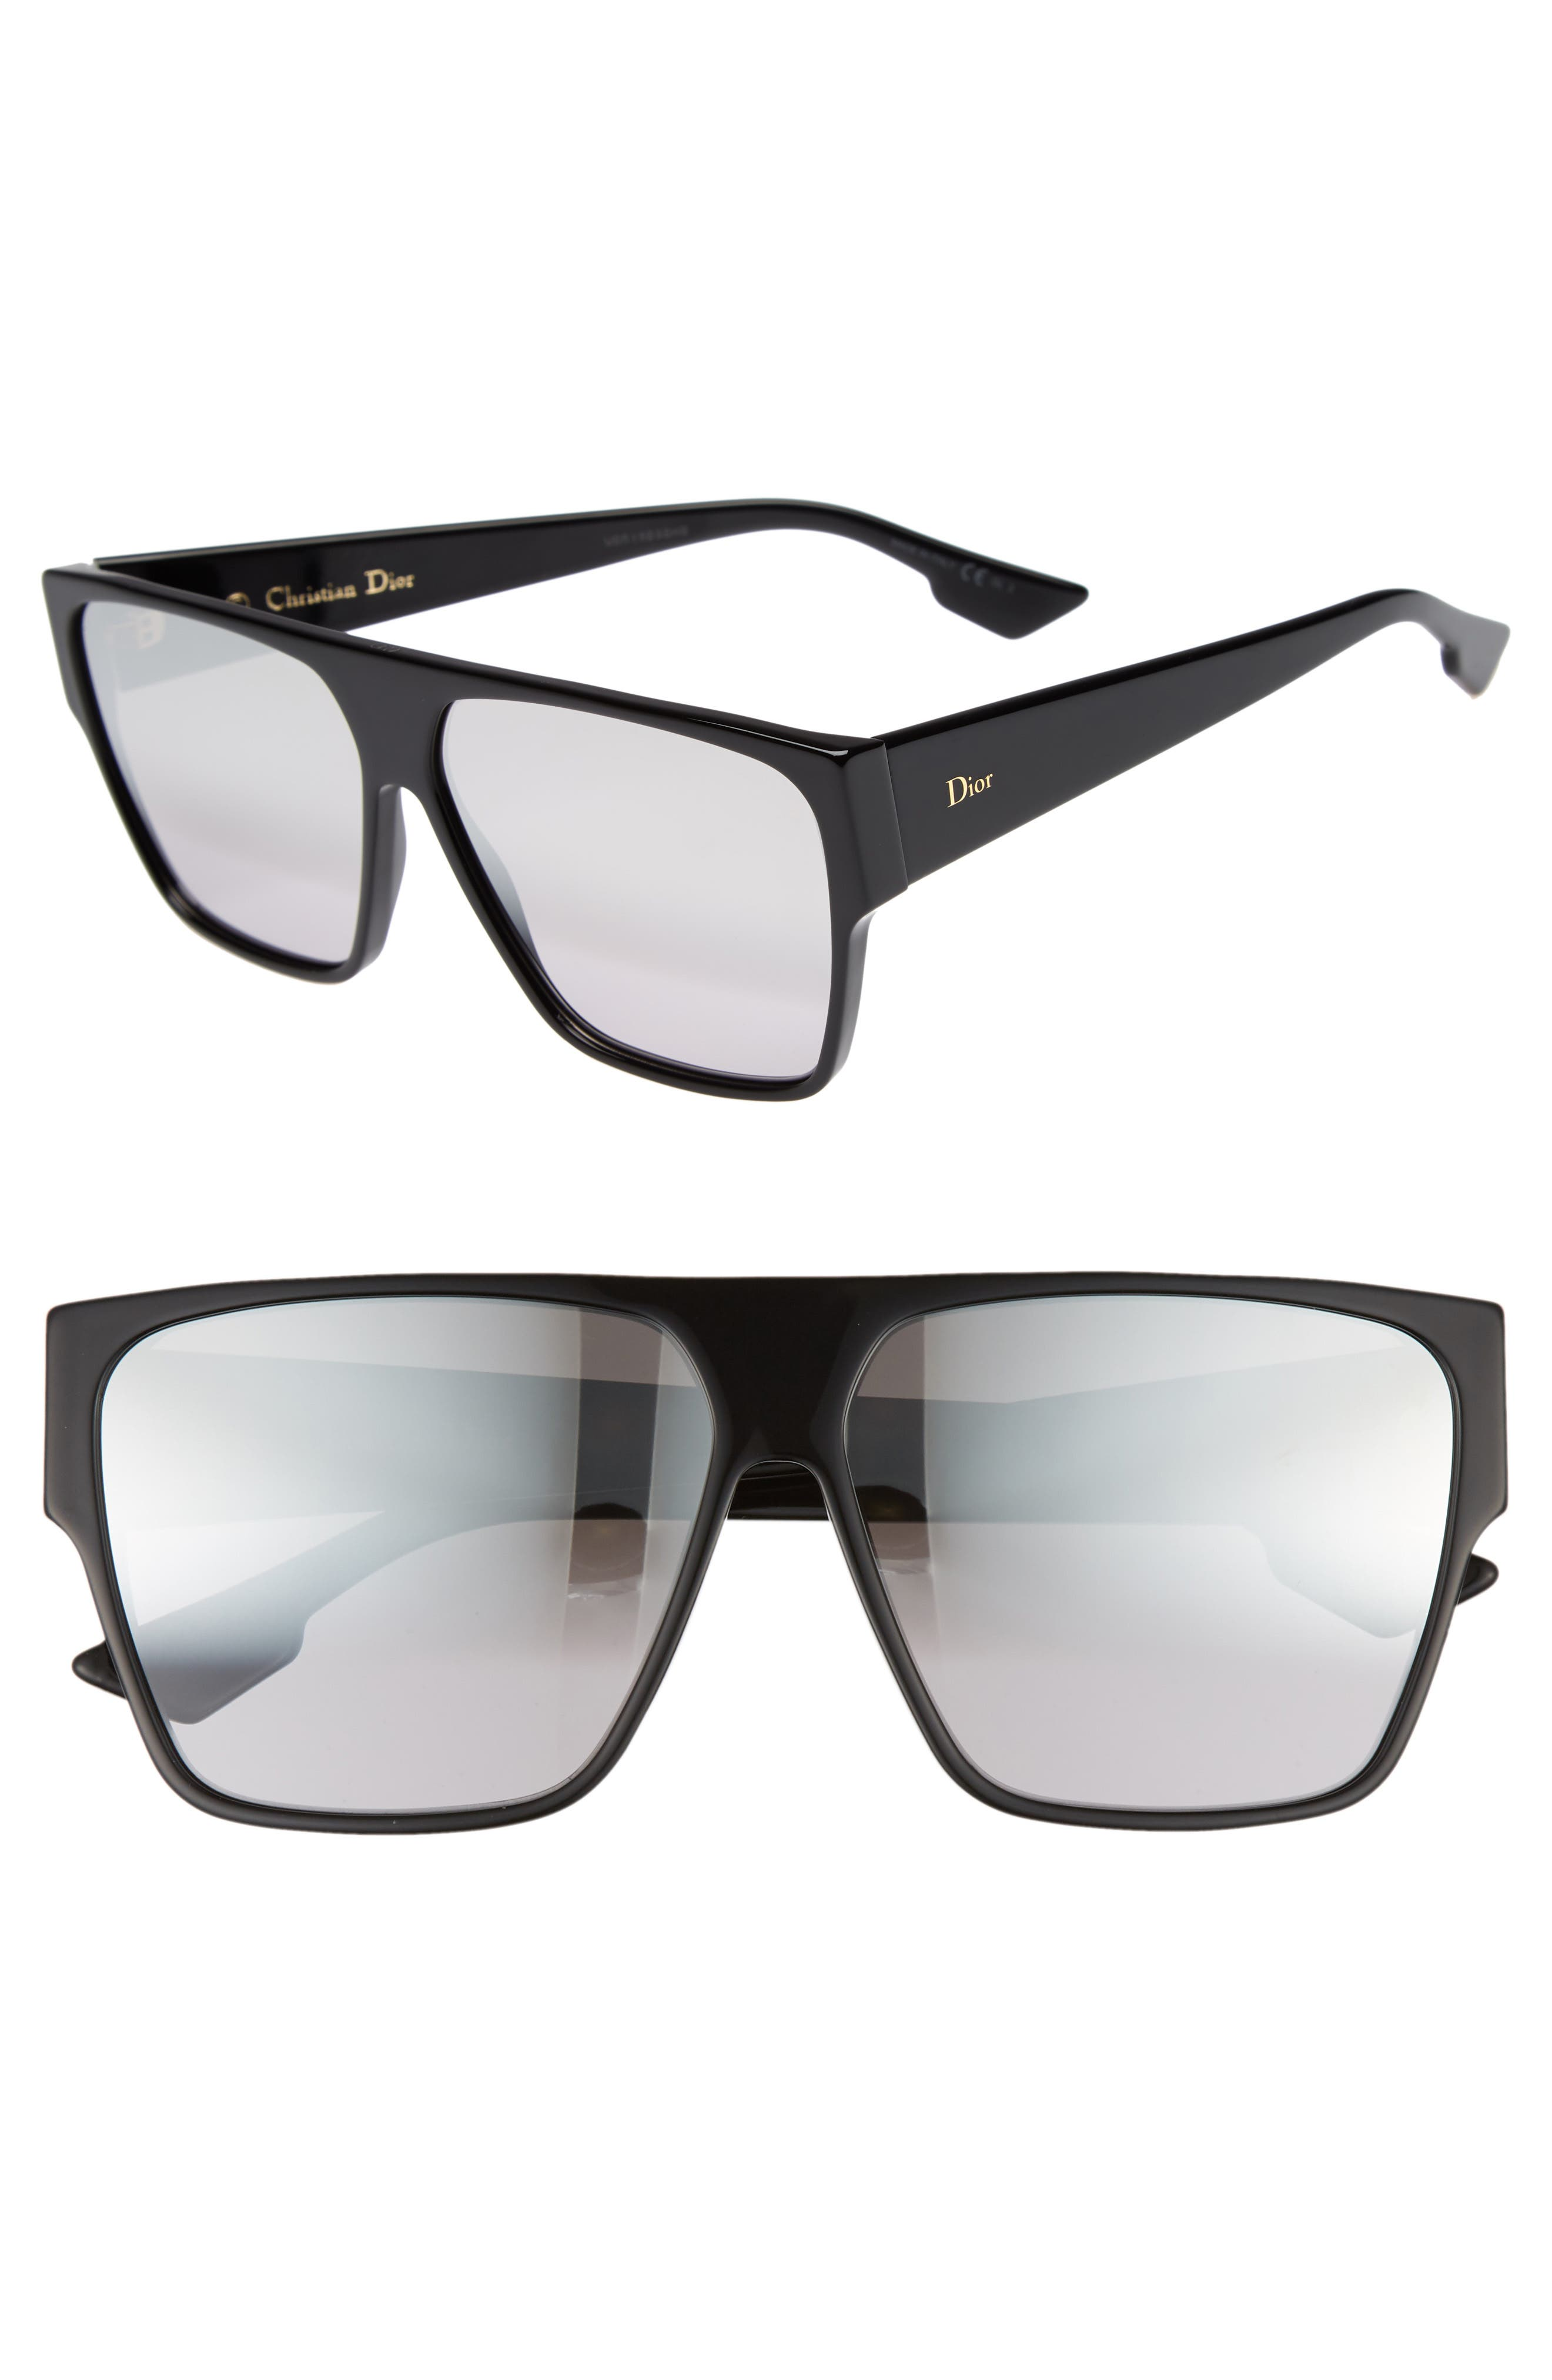 DIOR, 62mm Flat Top Square Sunglasses, Main thumbnail 1, color, BLACK